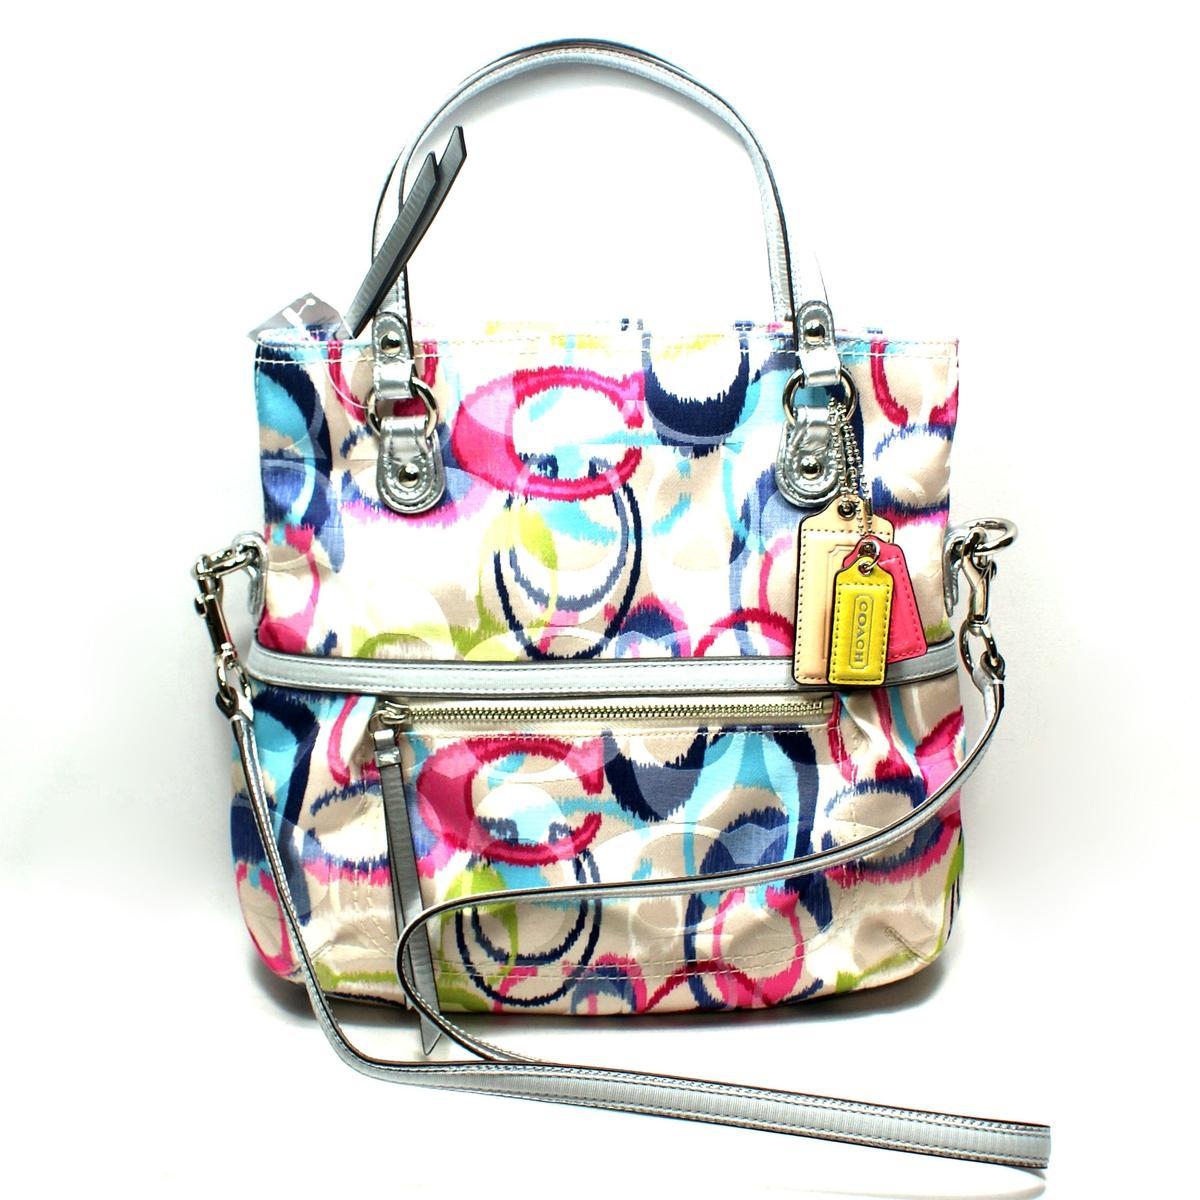 ... purchase coach poppy ikat signature foldover crossbody bag handbag  19873 9e151 7817e 979e933f5814d